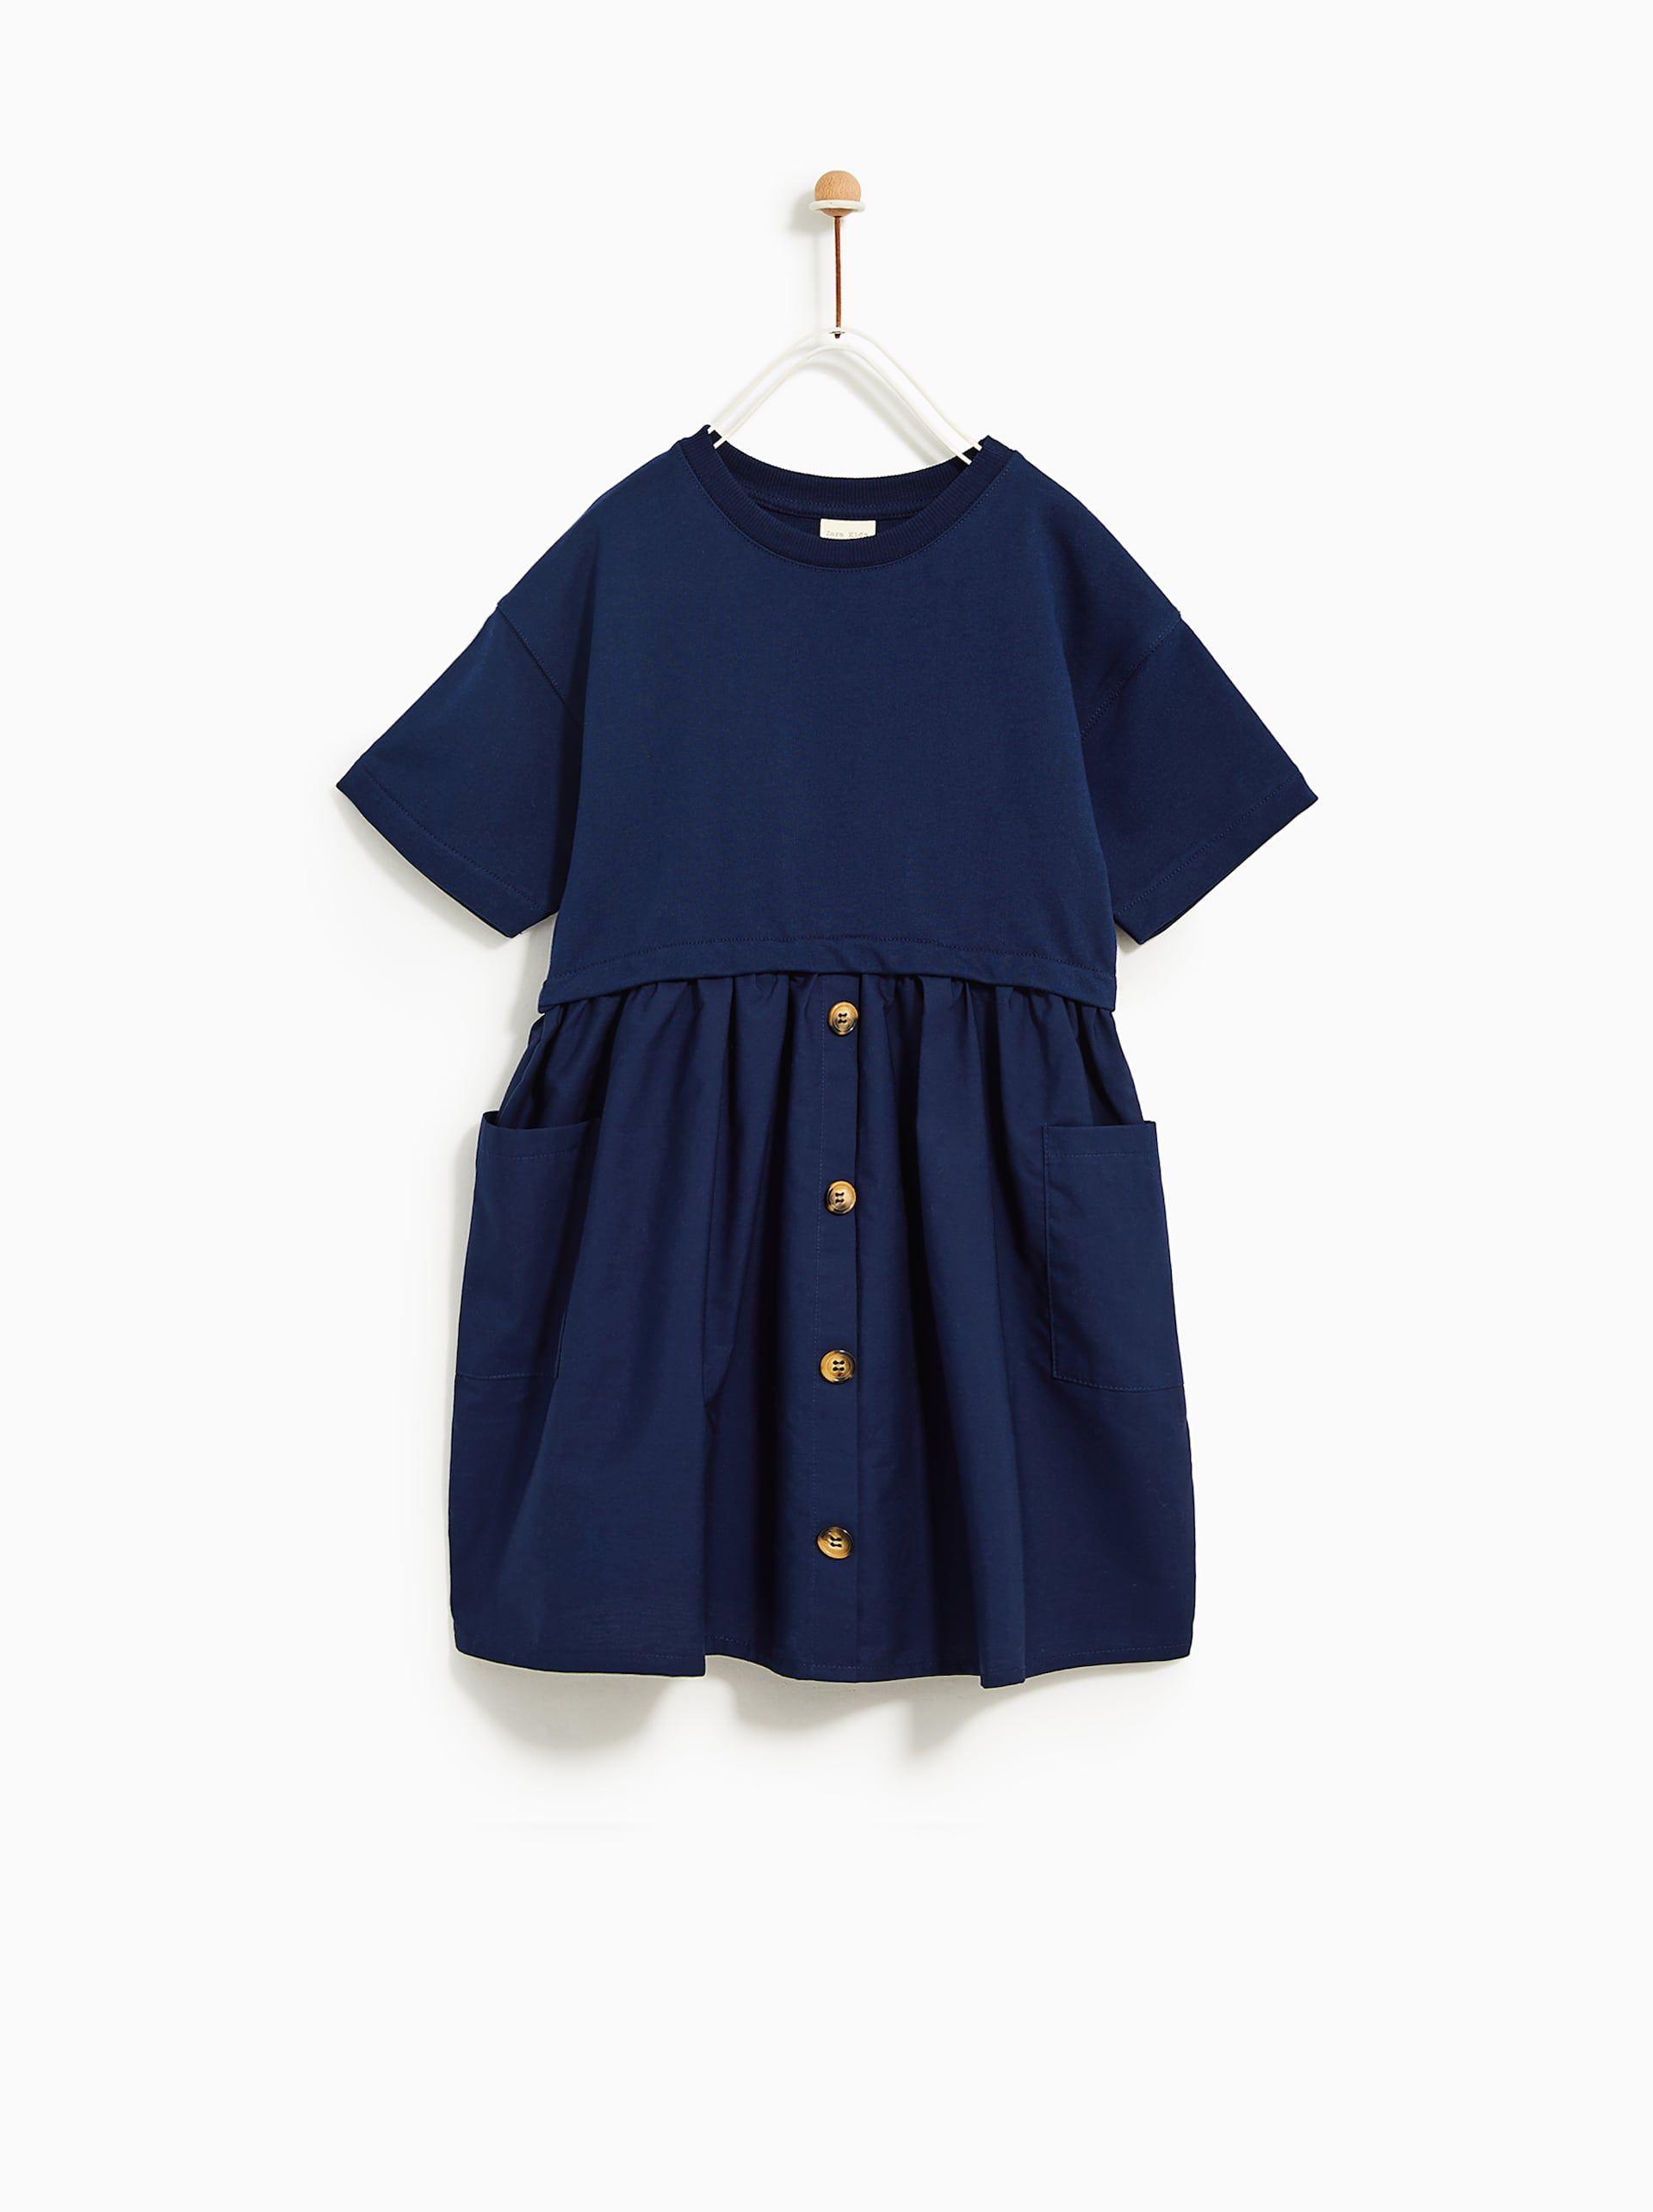 Combination Poplin Dress Kids Clothes Uk Discount Kids Clothes Kids Clothes Sale